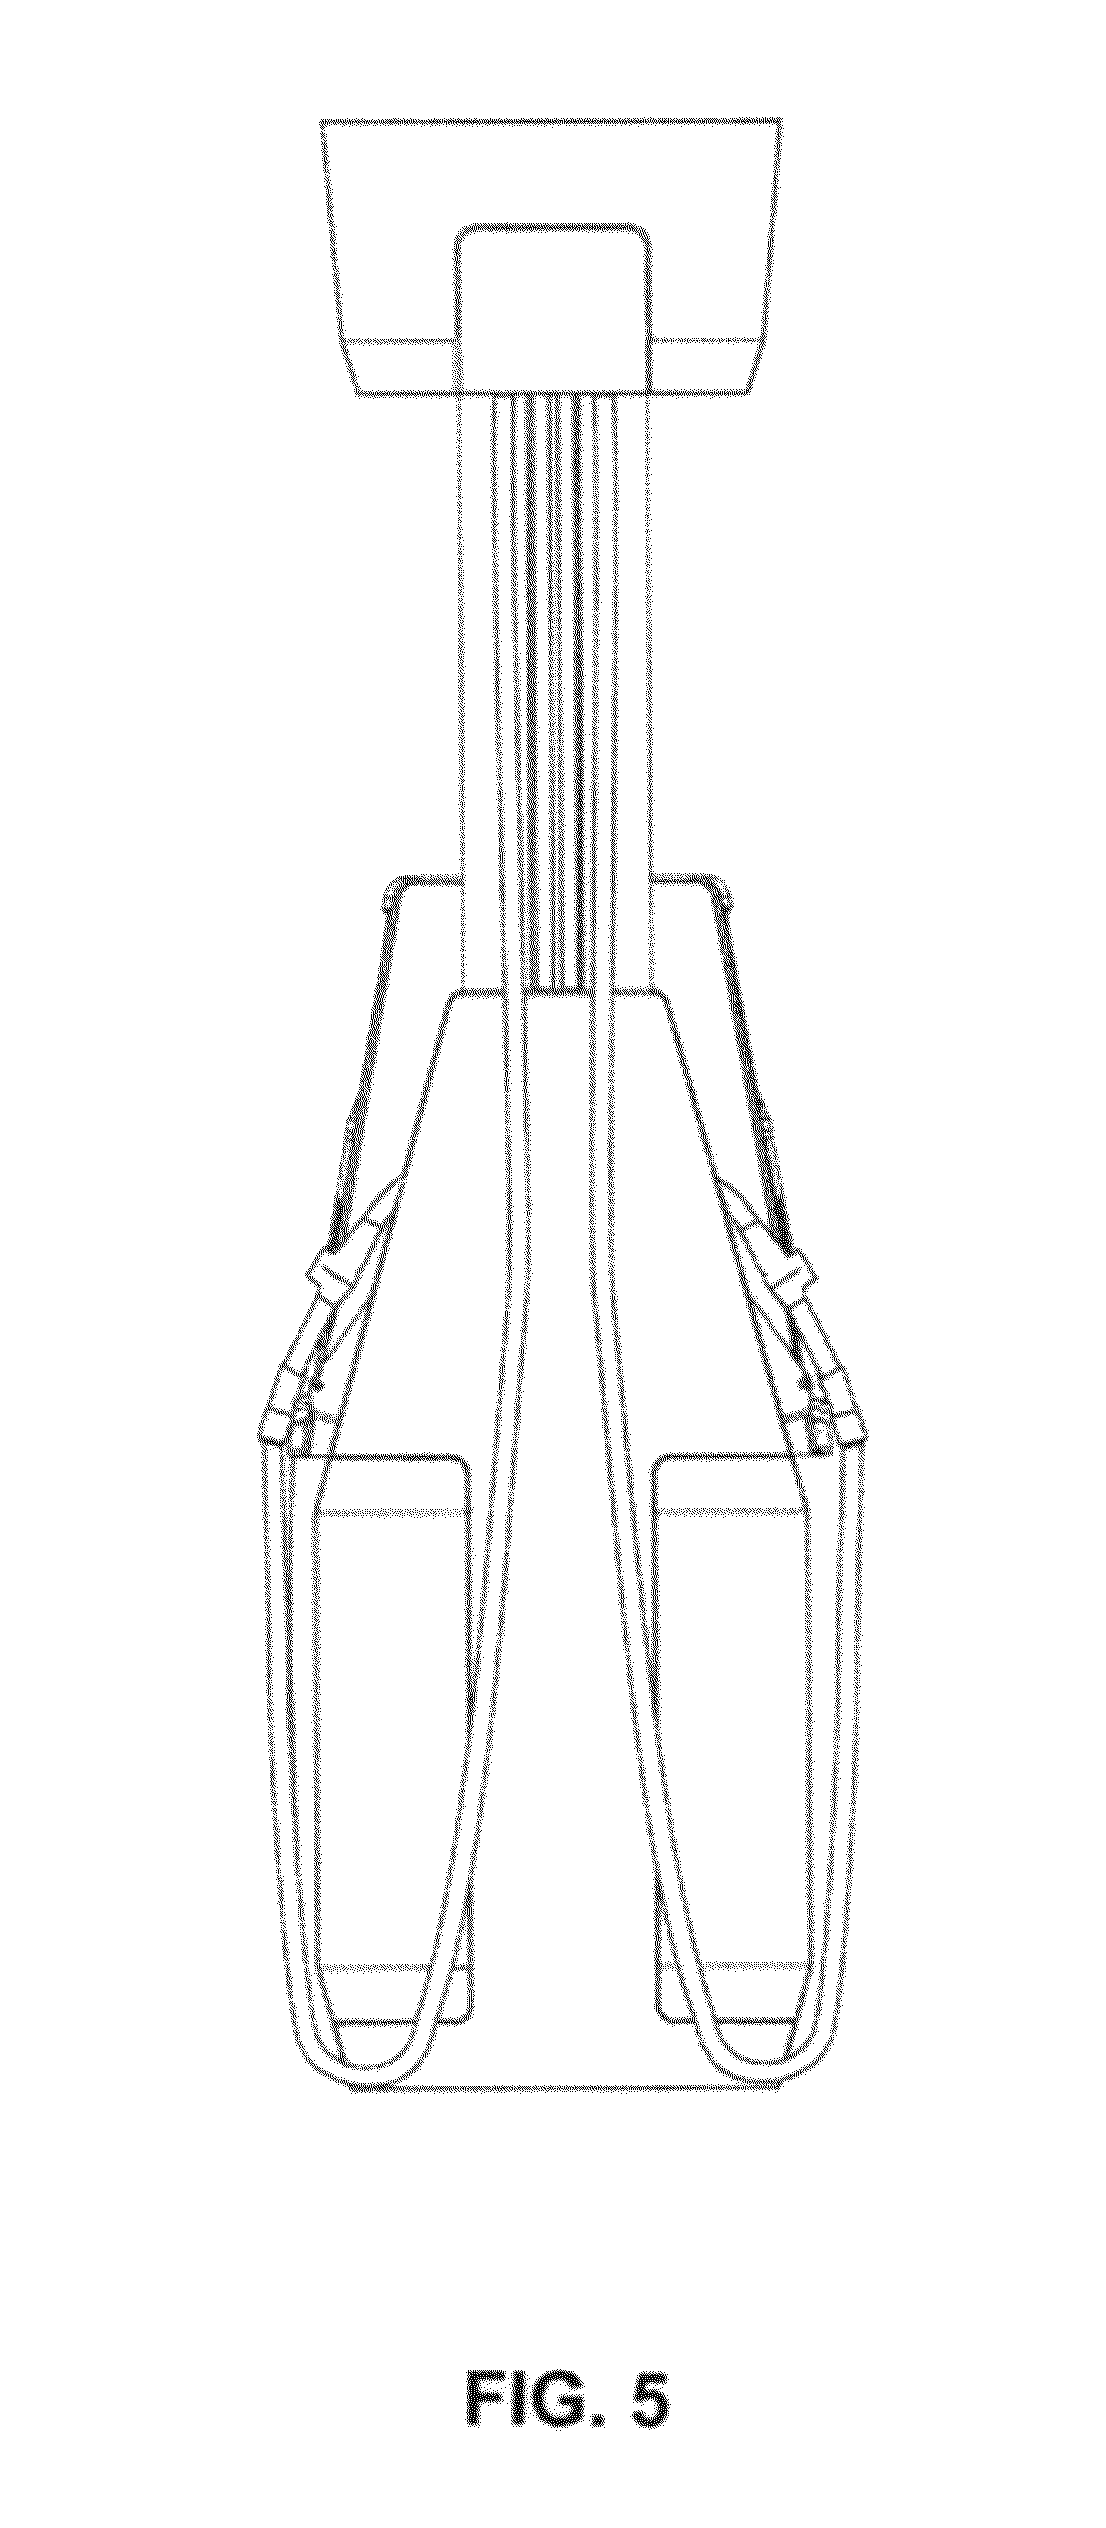 Patent USD677284  Fuel dispenser  Google Patents